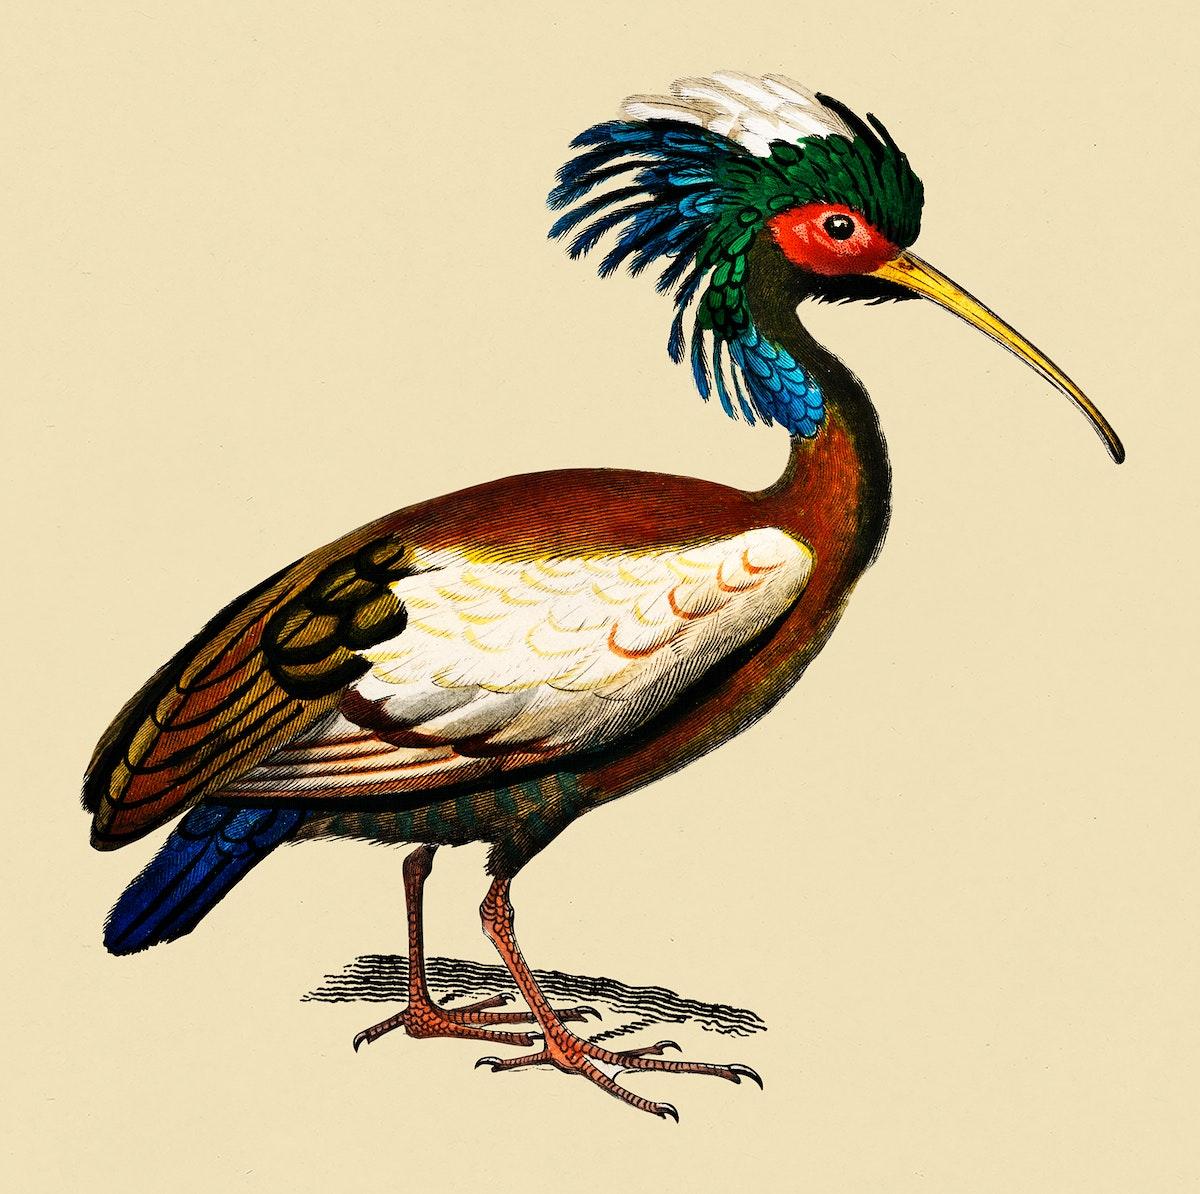 Vintage Illustration of Madagascan ibis.